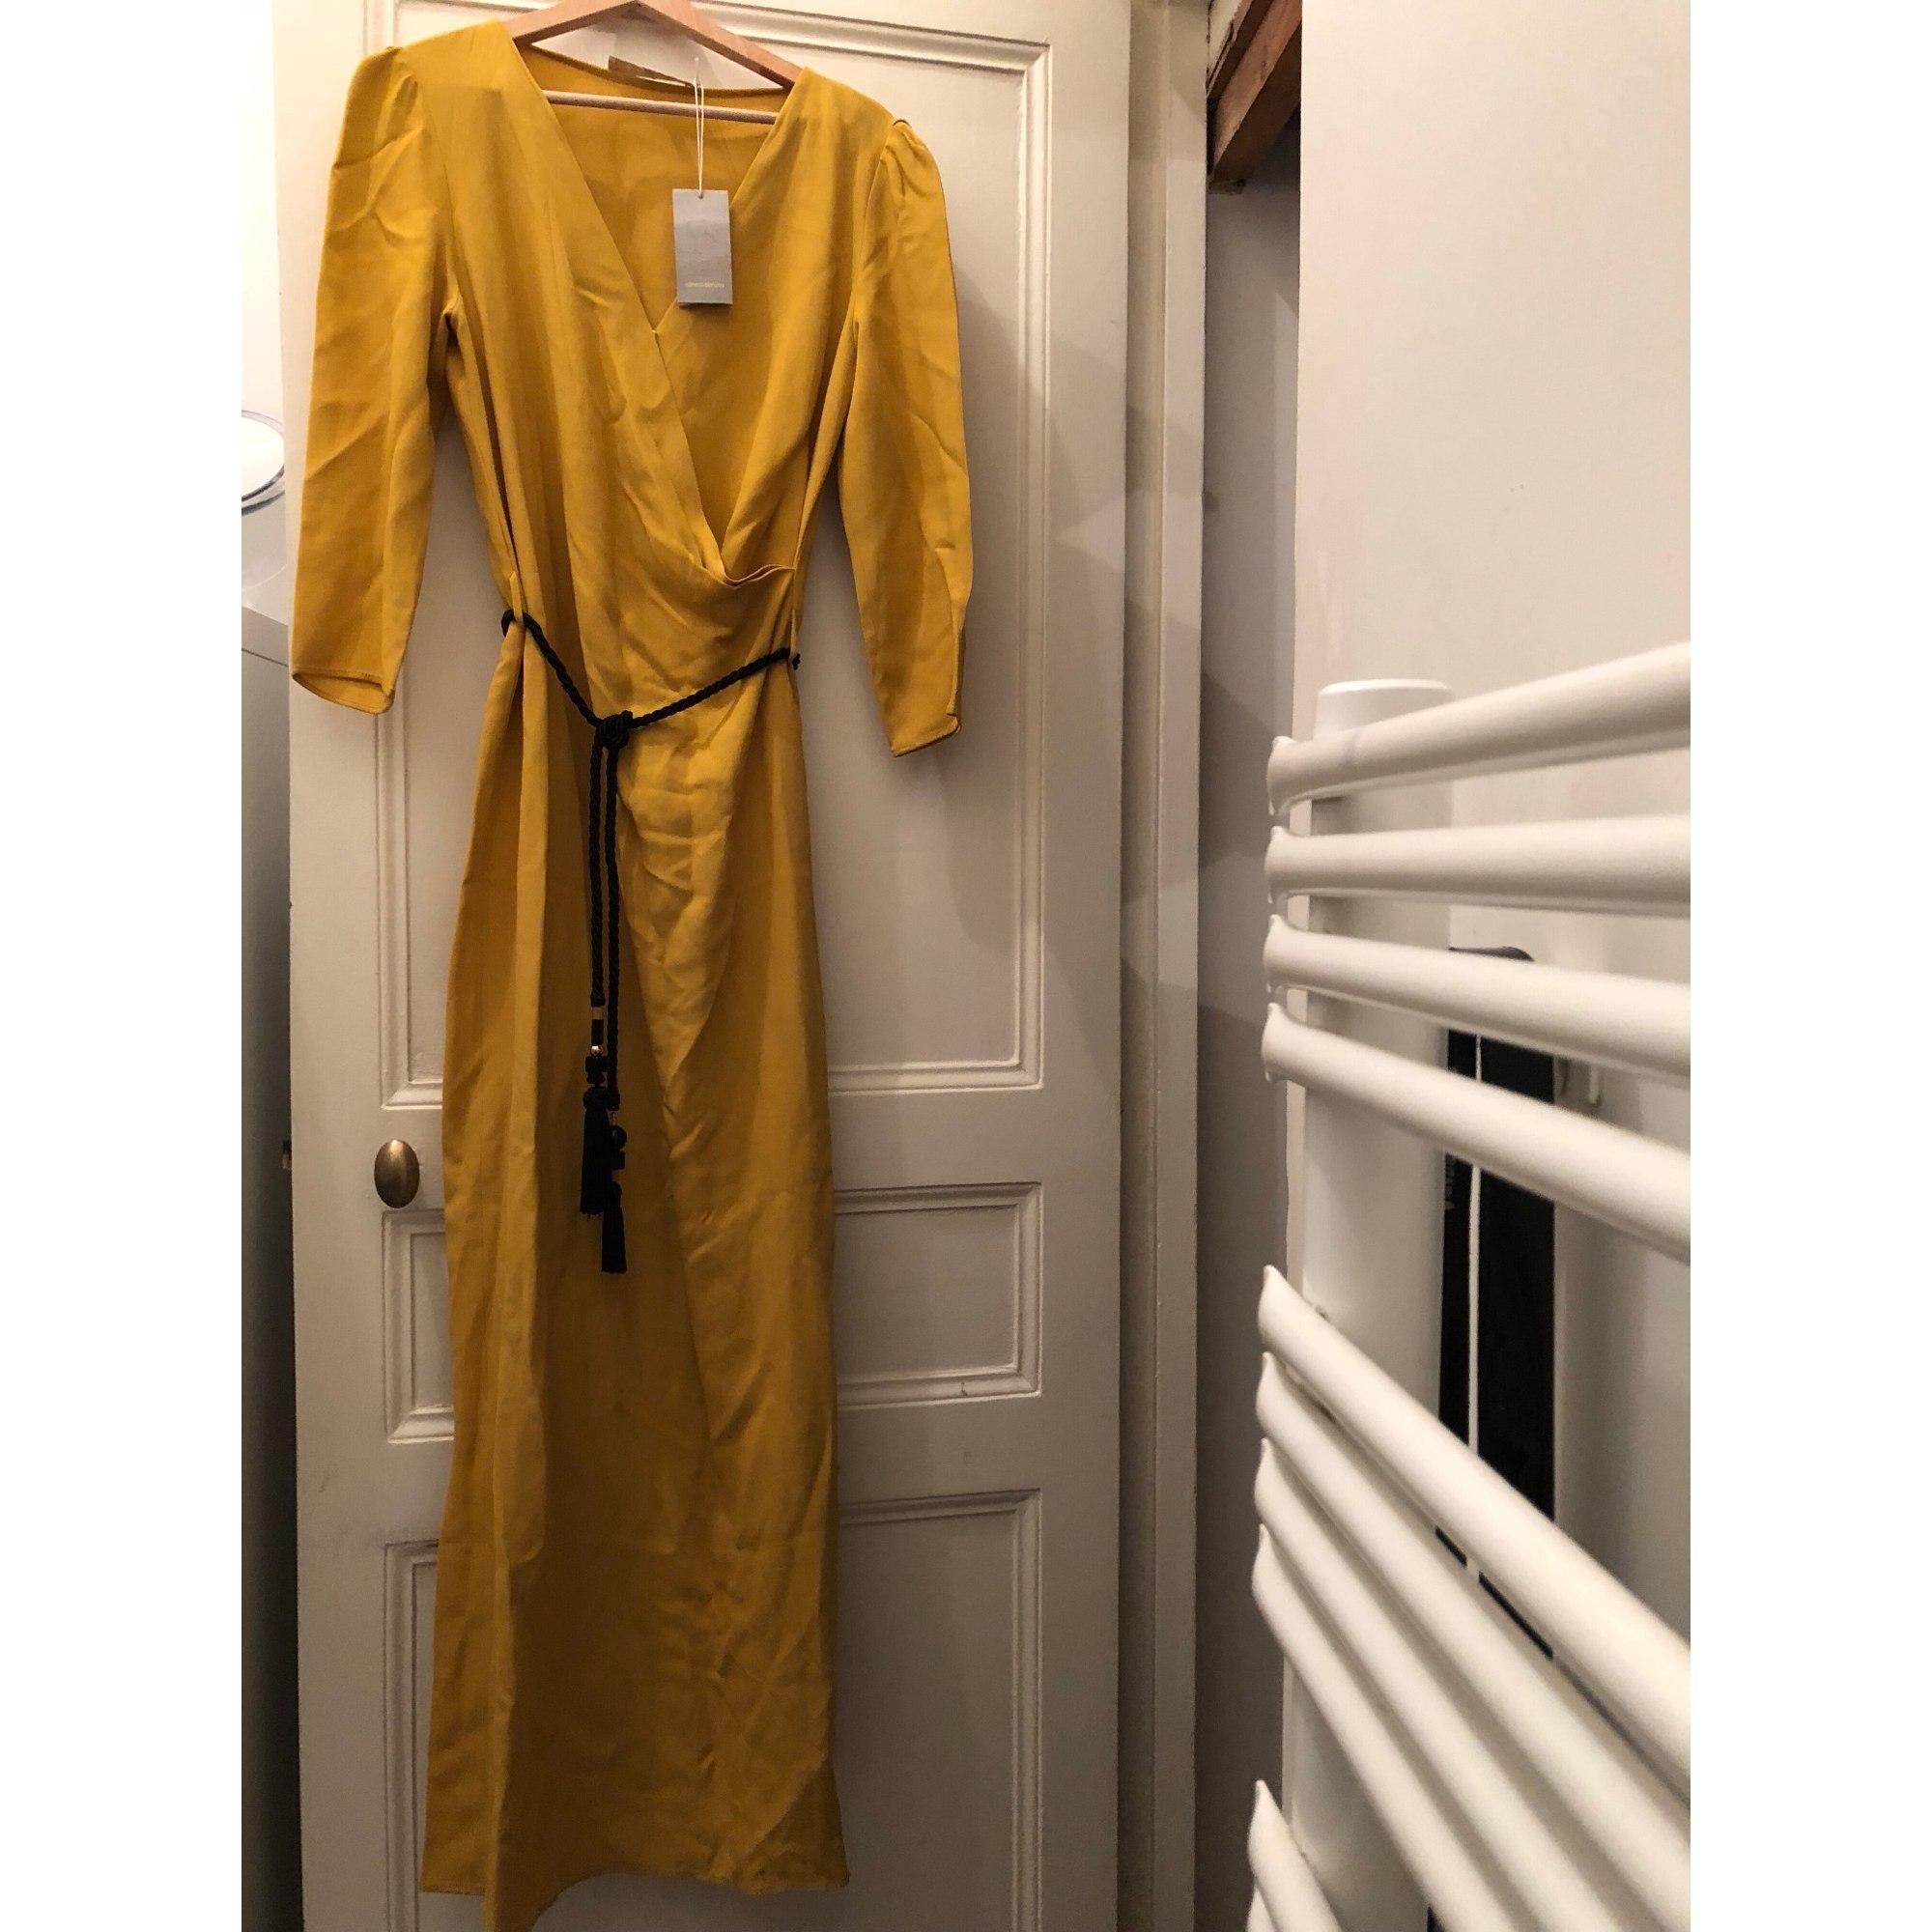 Robe Longue Vanessa Bruno 38 M T2 Jaune Moutarde 8481207